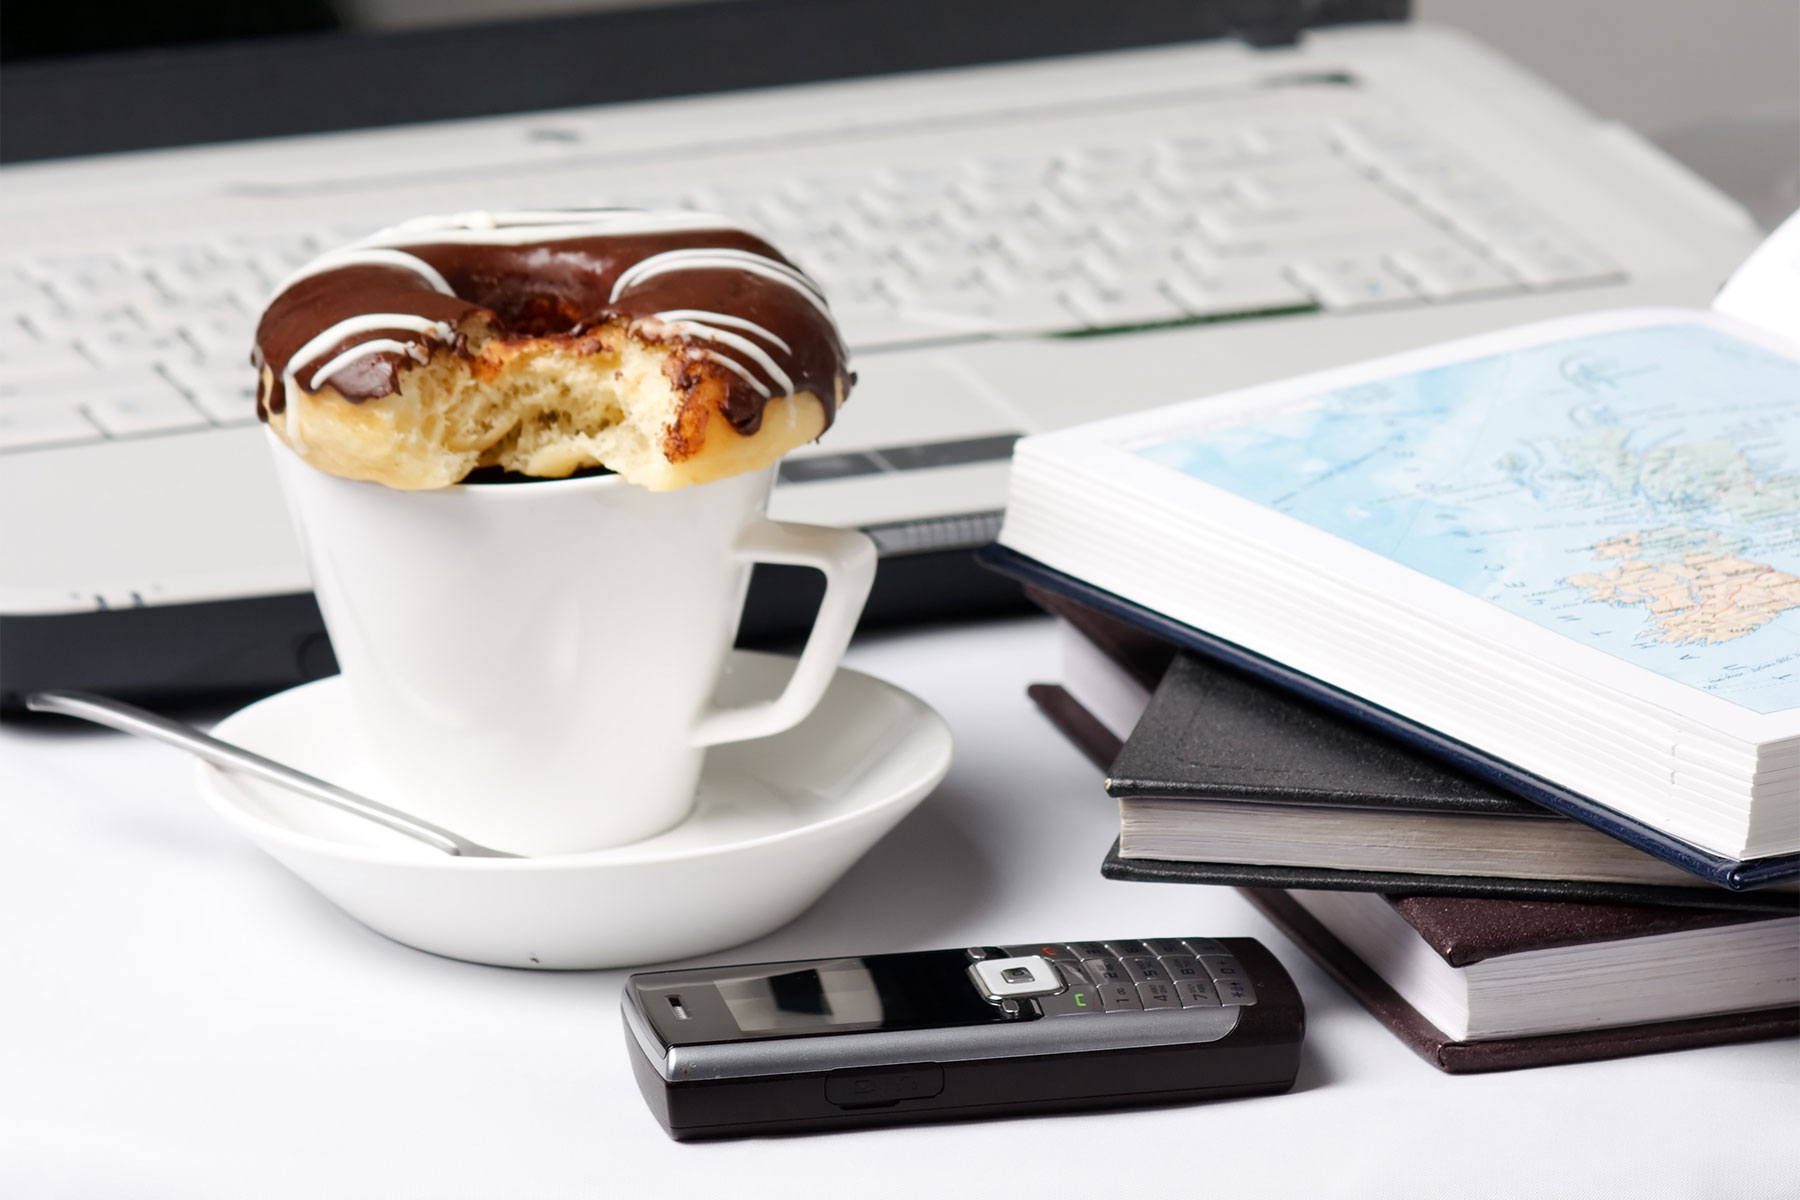 brownie rezept mini guglhupf schnelle s e snacks f r kollegen. Black Bedroom Furniture Sets. Home Design Ideas